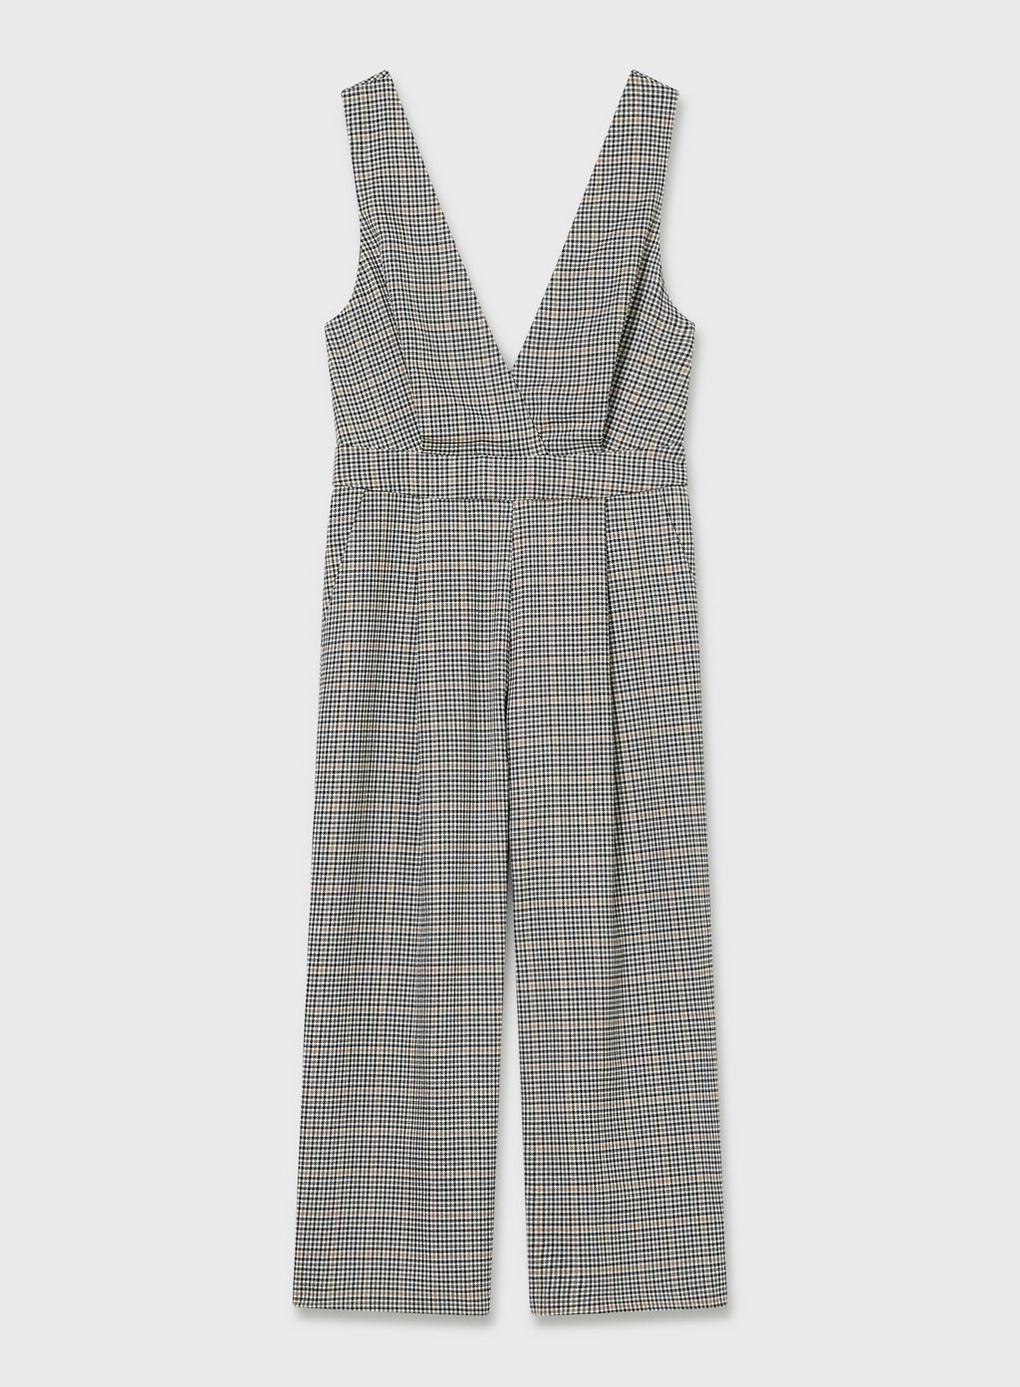 da95771cf1 Check Pinafore Jumpsuit Was £45.00 Now £40.50 -  casualwear  eveningwear   collectionsfashion  instafashion  ootd  womensclothing  loveisland ...